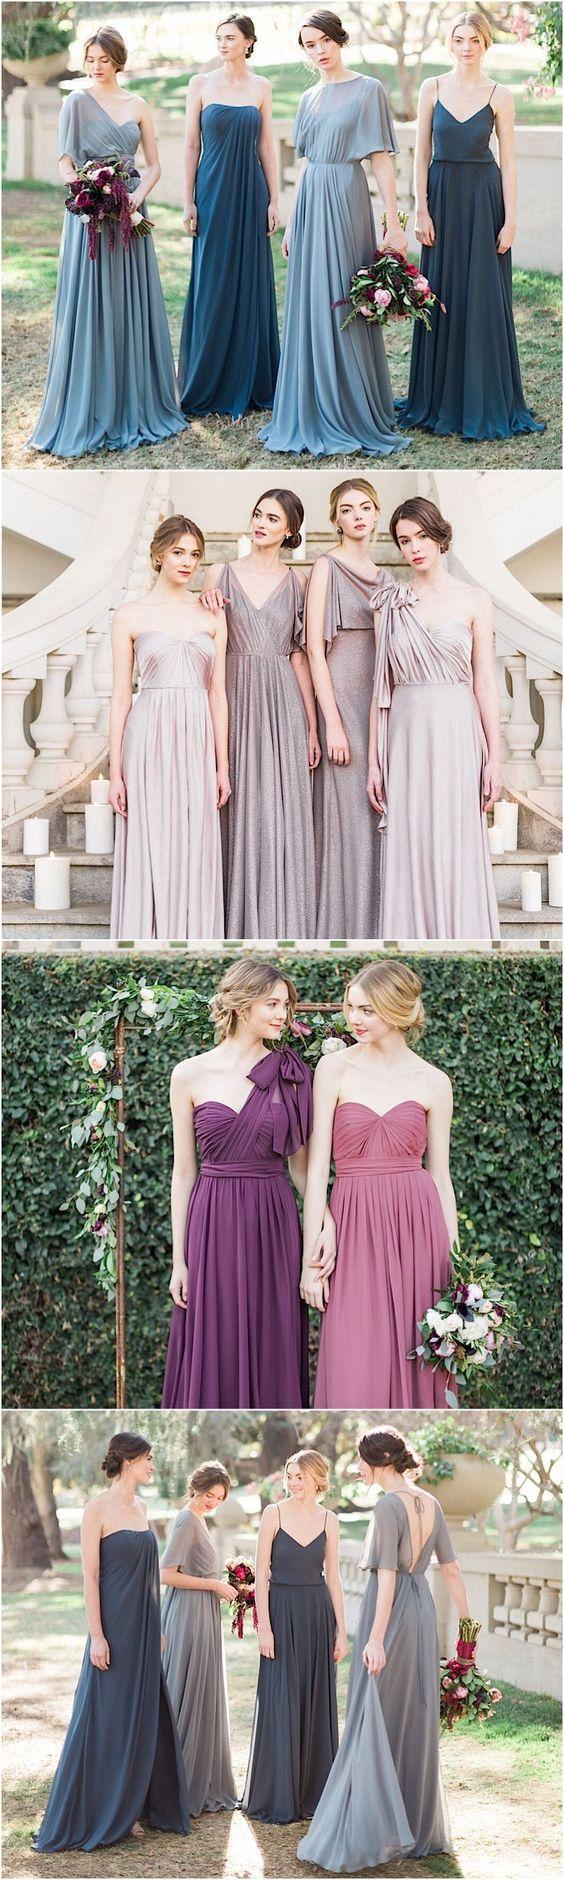 Gorgeous bridesmaid dresses by Jenny Yoo: